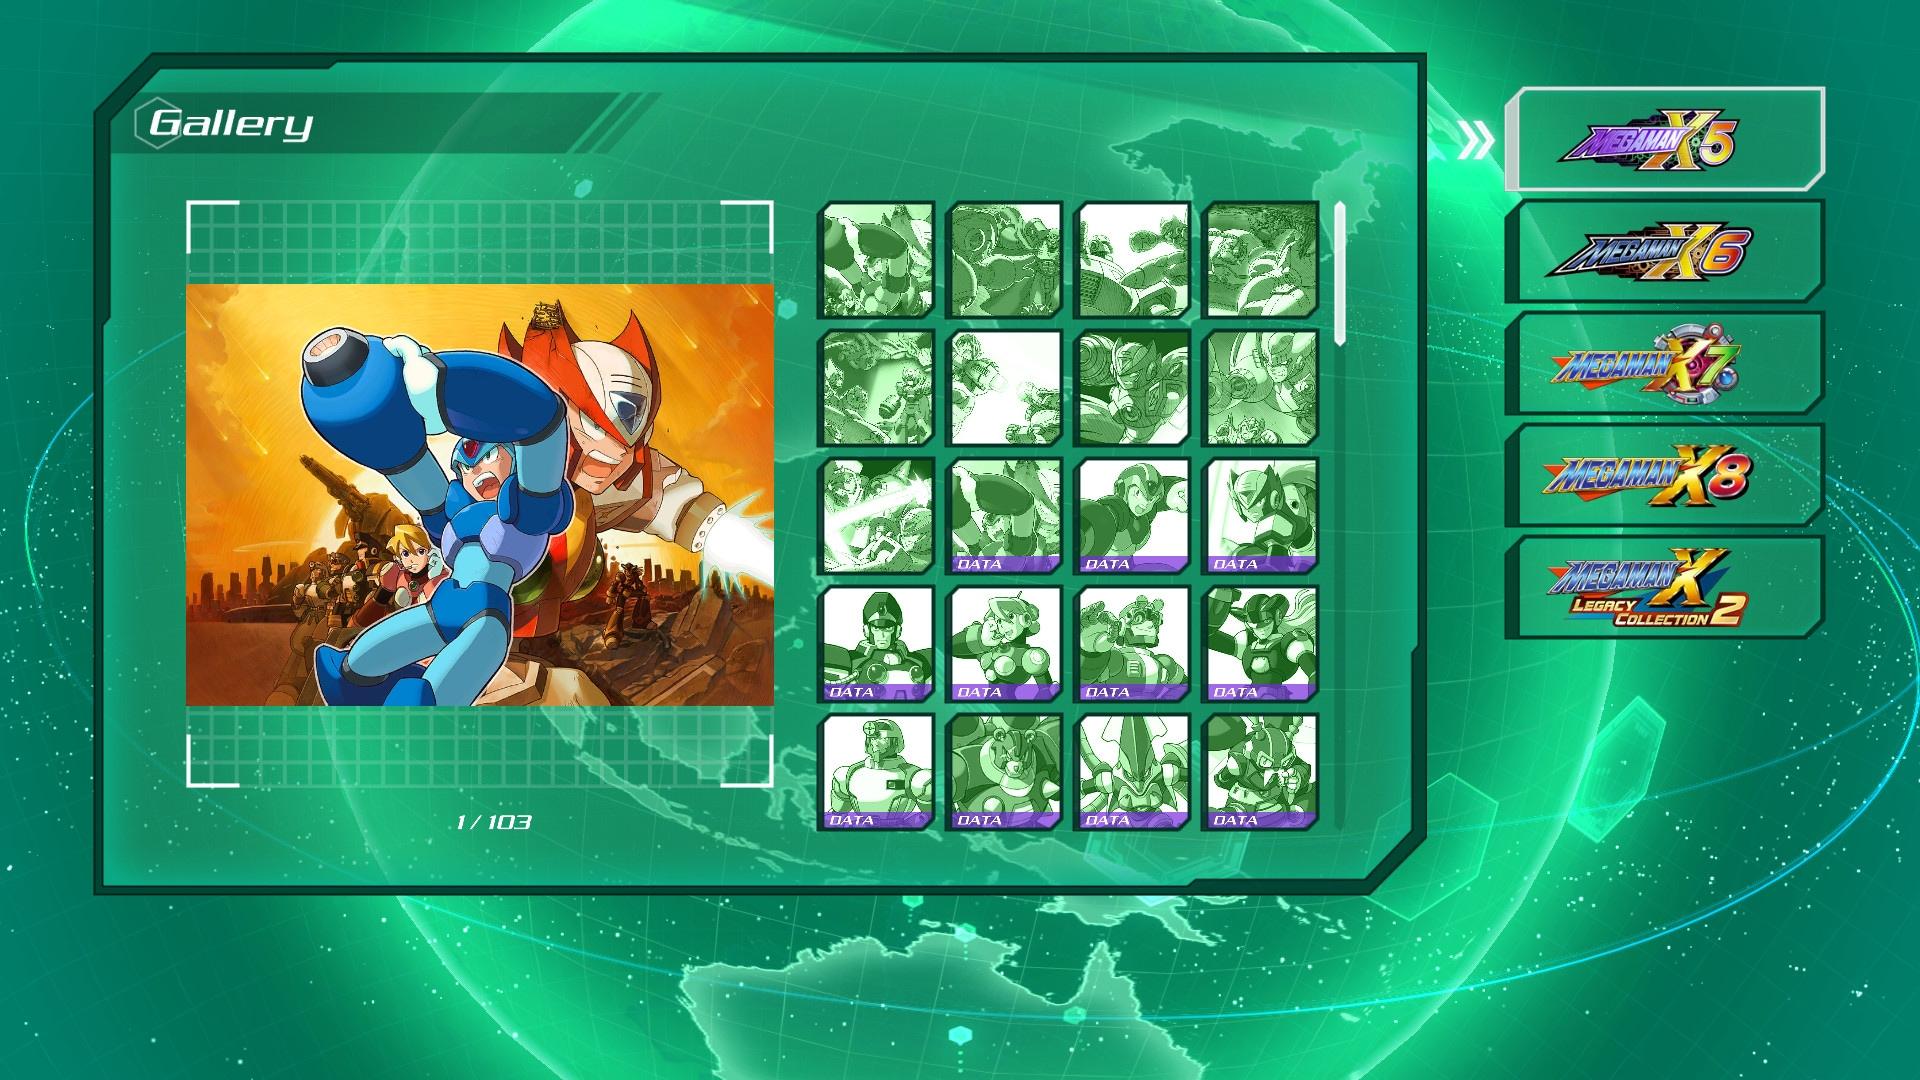 Buy Mega Man X Legacy Collection 2 / ロックマンX アニバーサリー コレクション 2 Steam Key  GLOBAL - Cheap - G2A.COM!